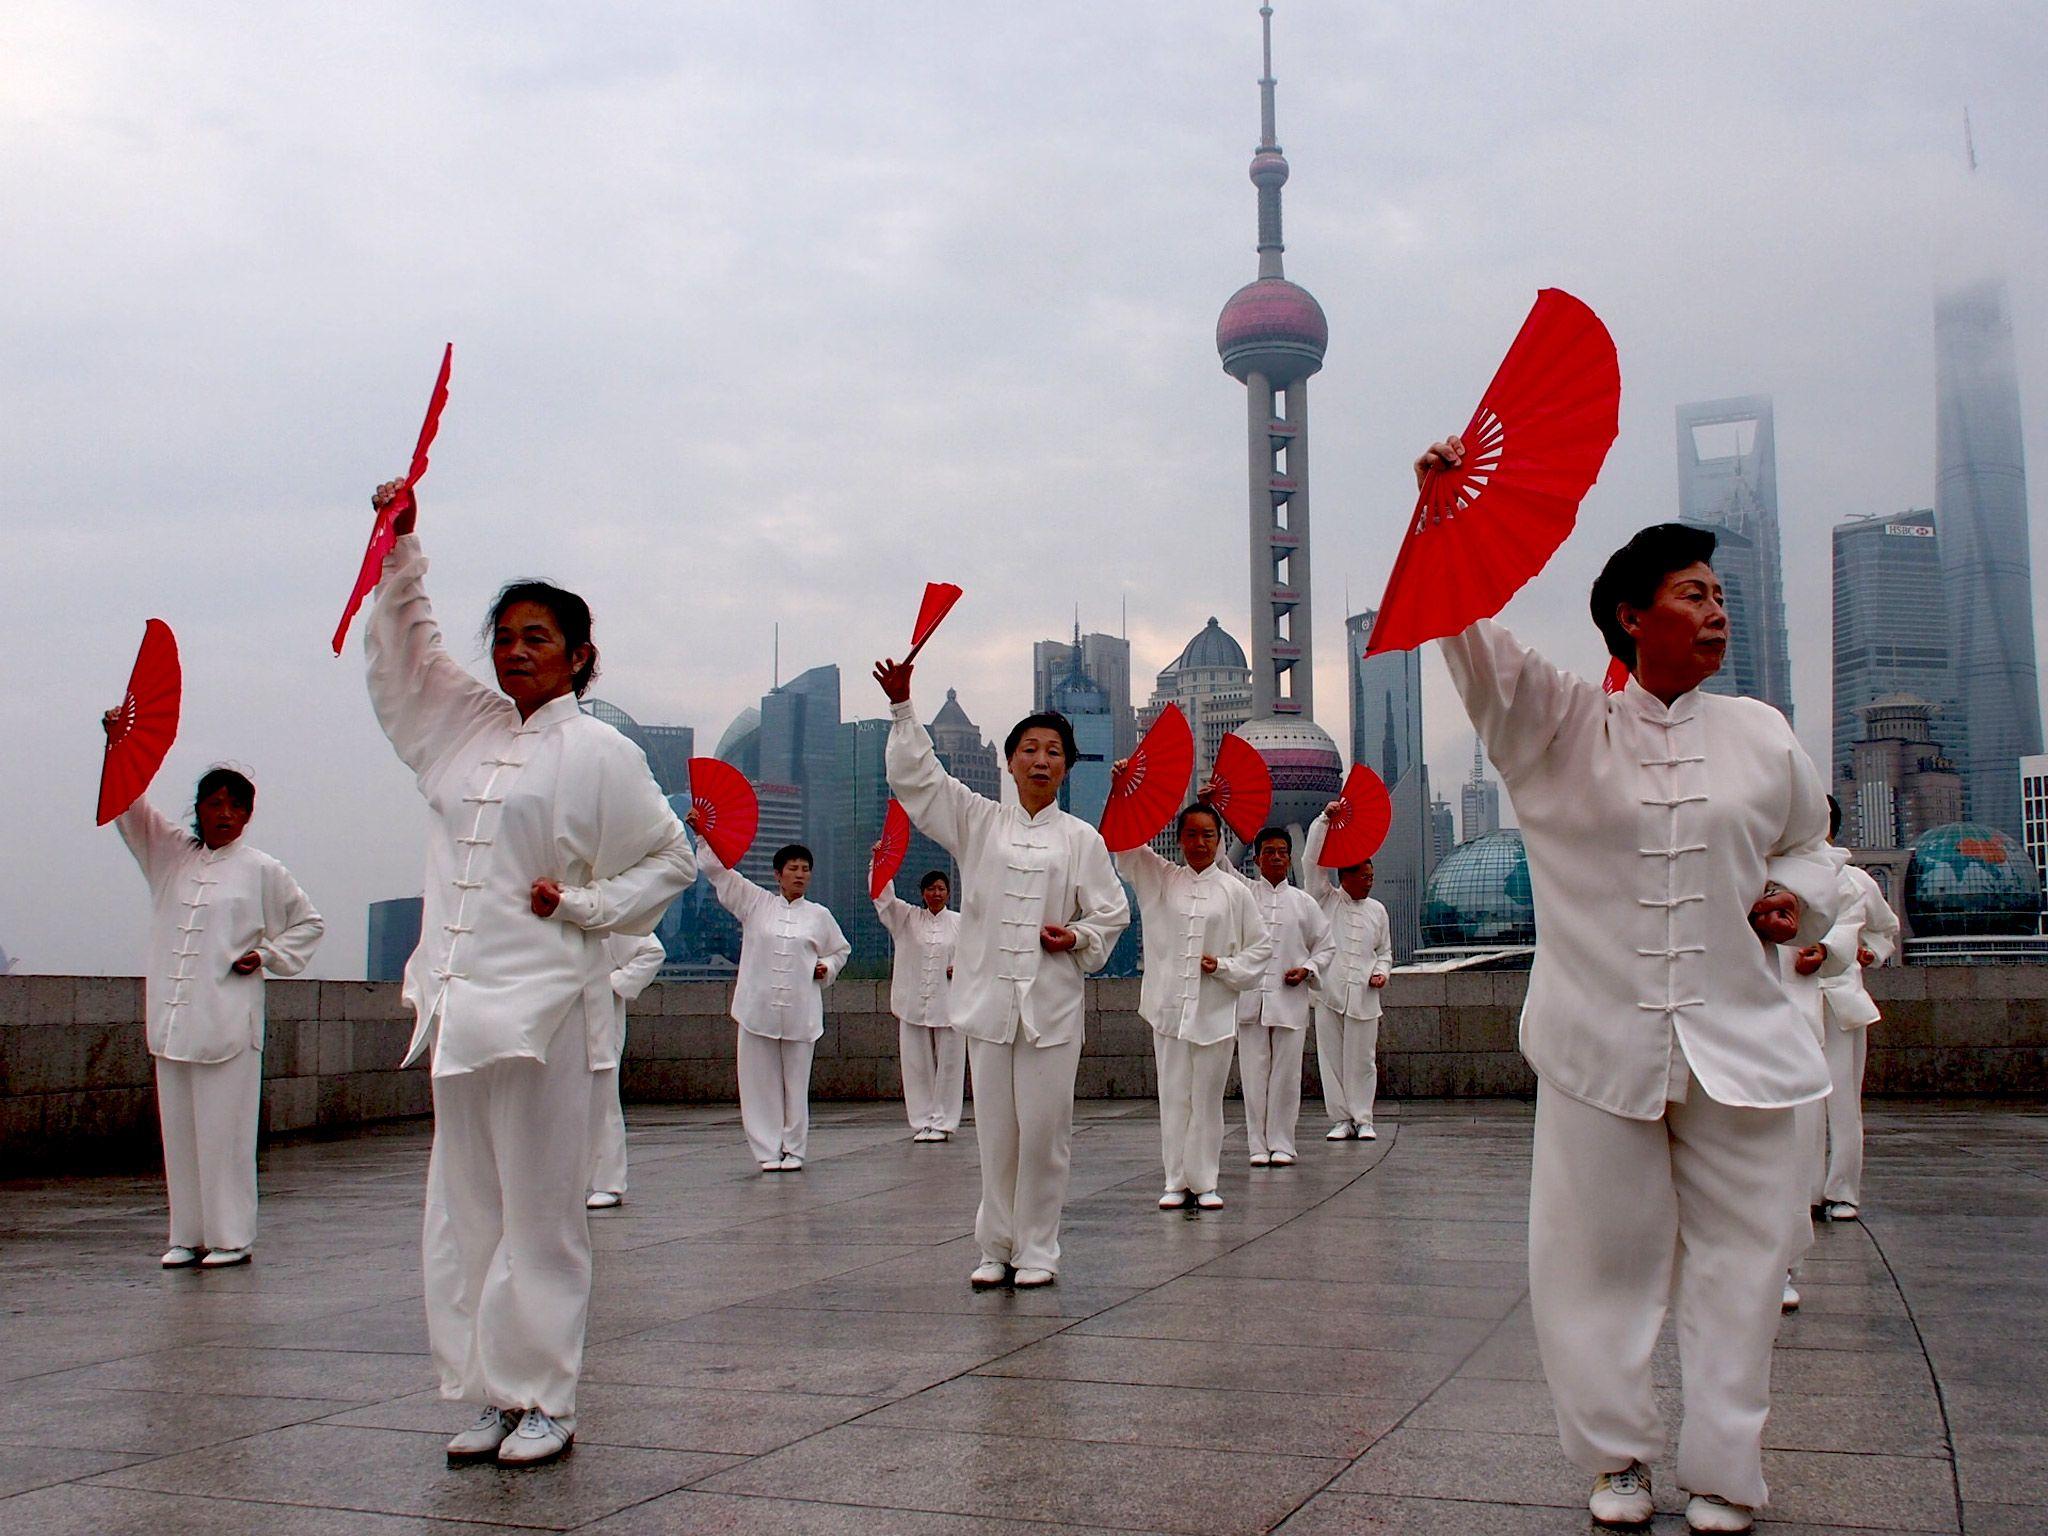 Shanghai: Taiji practitioners by the Bund. [Фото дня - Июль 2015]